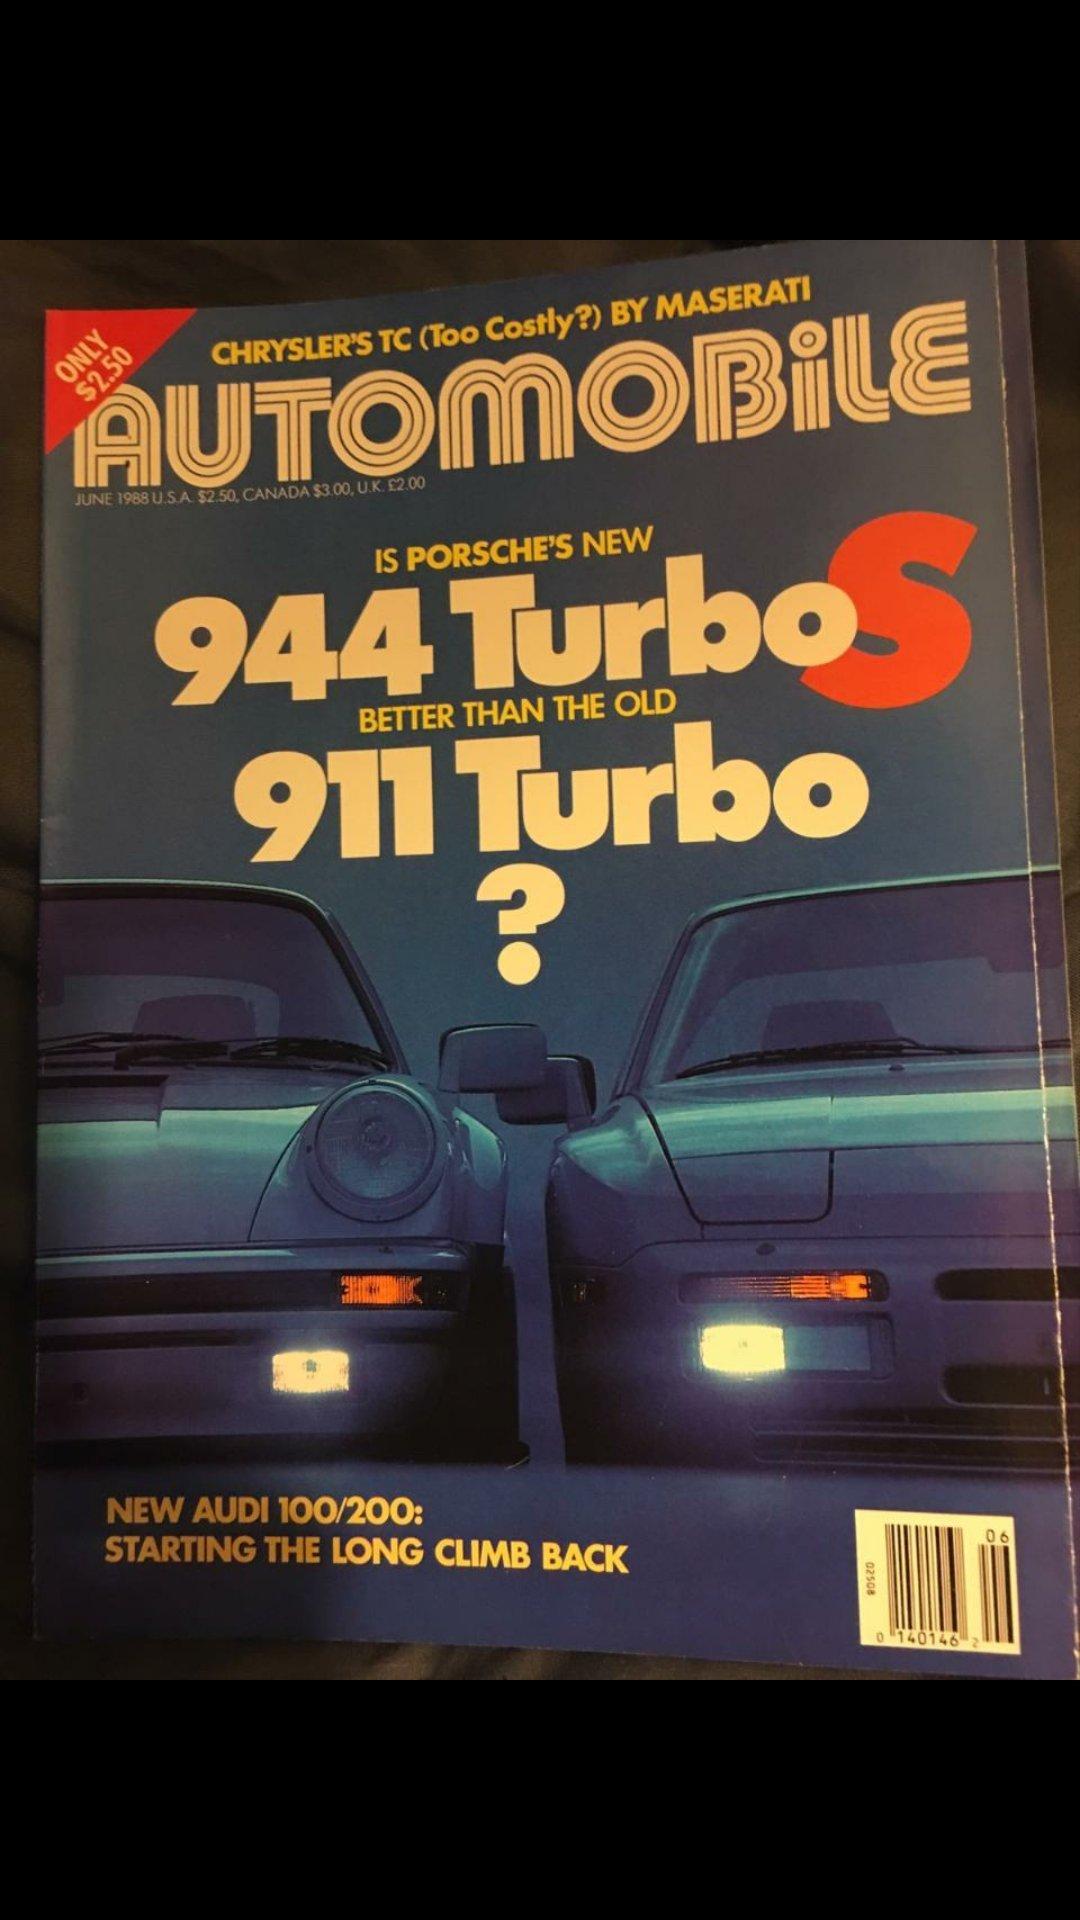 Automobile Magazine, June 1988: Porsche 944 Turbo vs 911 Turbo, Chrysler TC, Audi 100/200, Single Issue Magazine – 1970